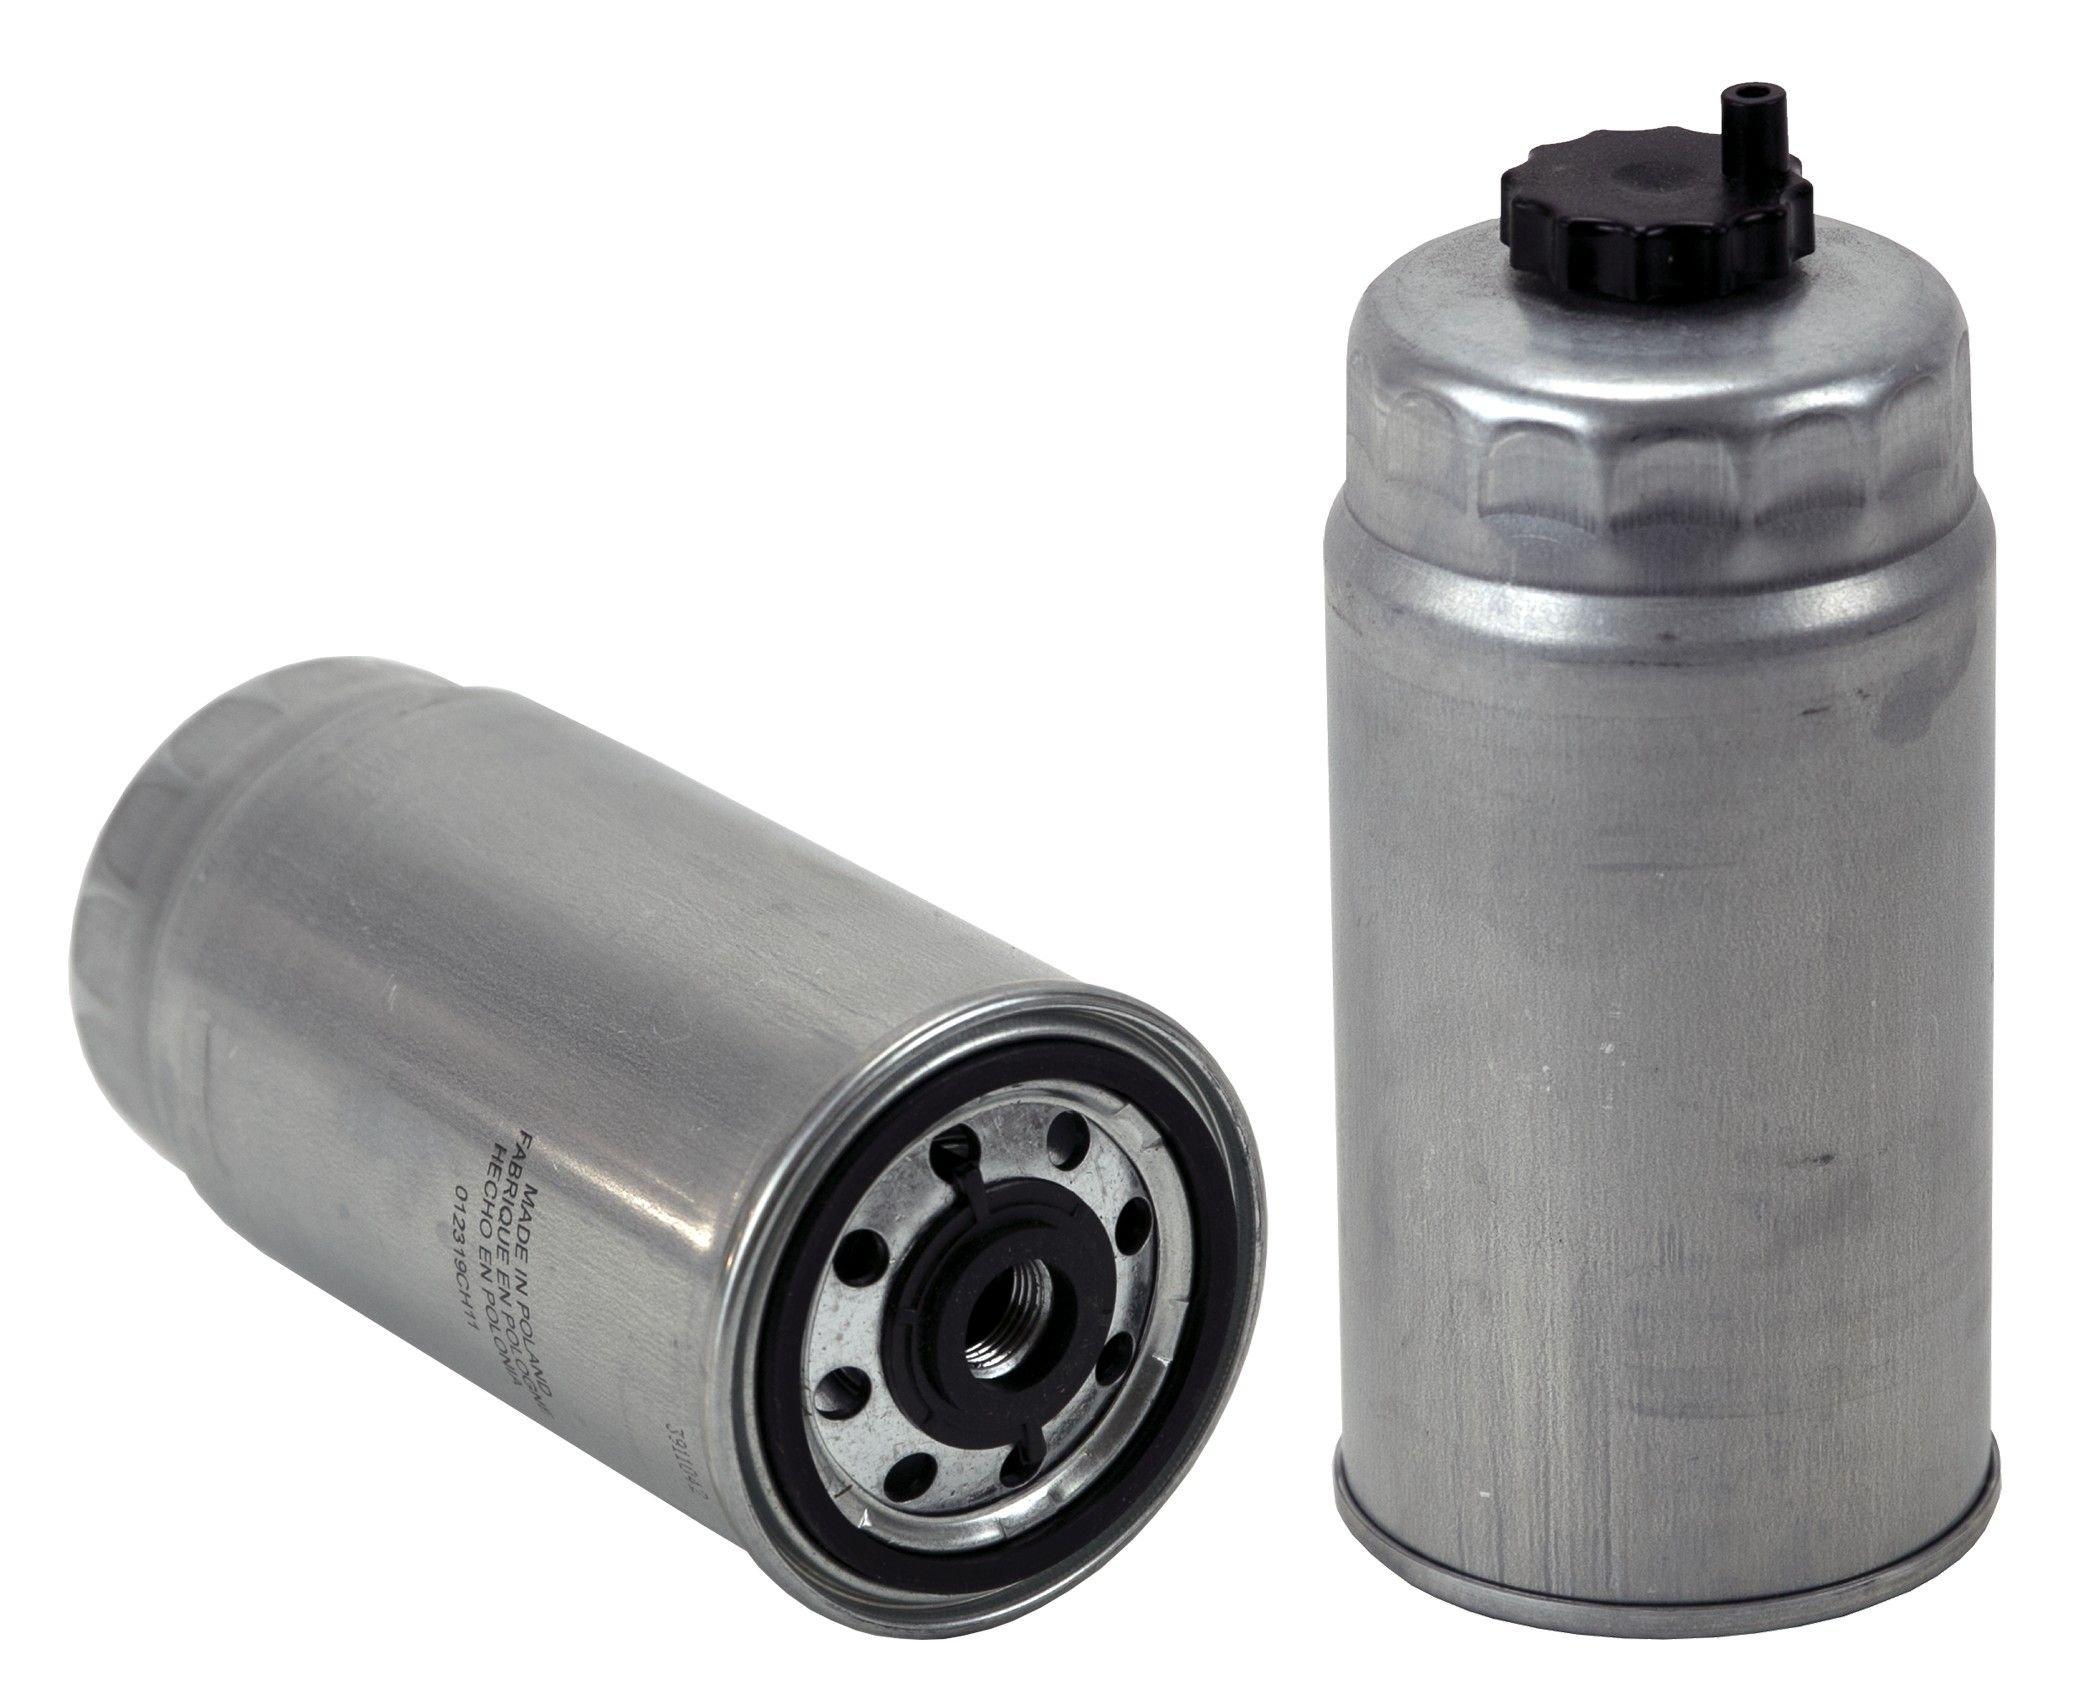 2005 Jeep Liberty Fuel Filter 4 Cyl 2.8L (Wix 33647)